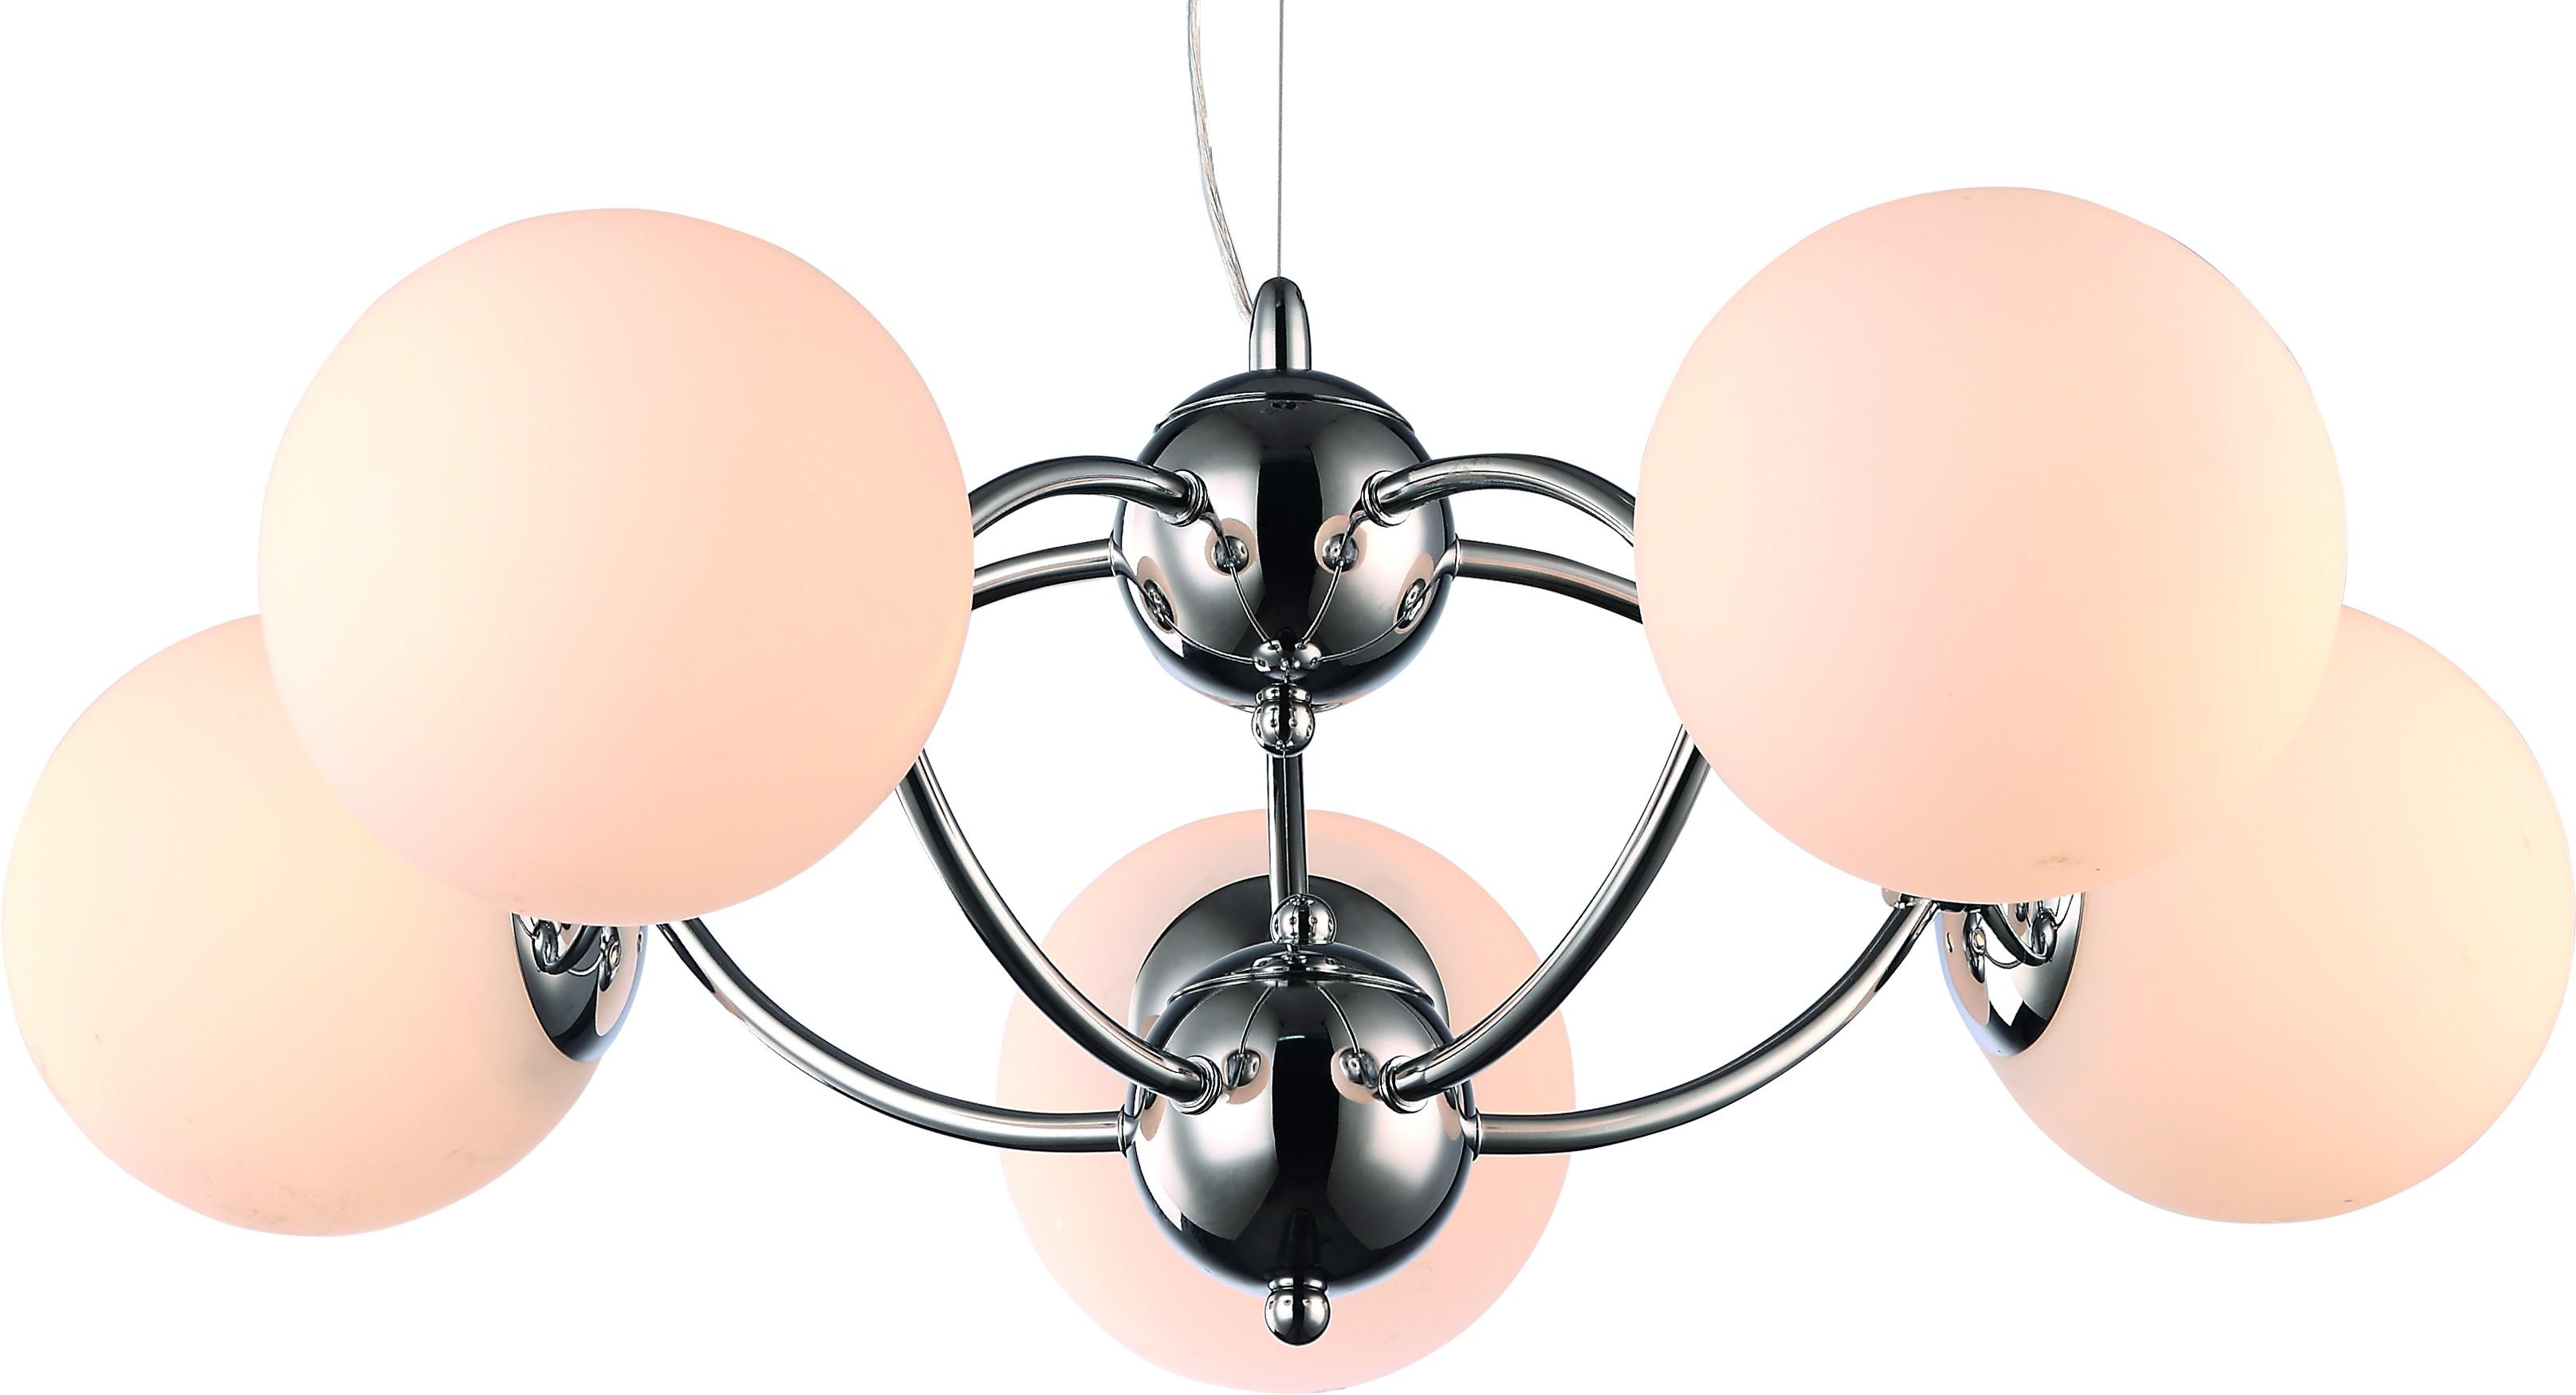 Люстра Arte lamp A9432sp-5cc arte lamp люстра подвесная arte lamp a9432sp 5cc